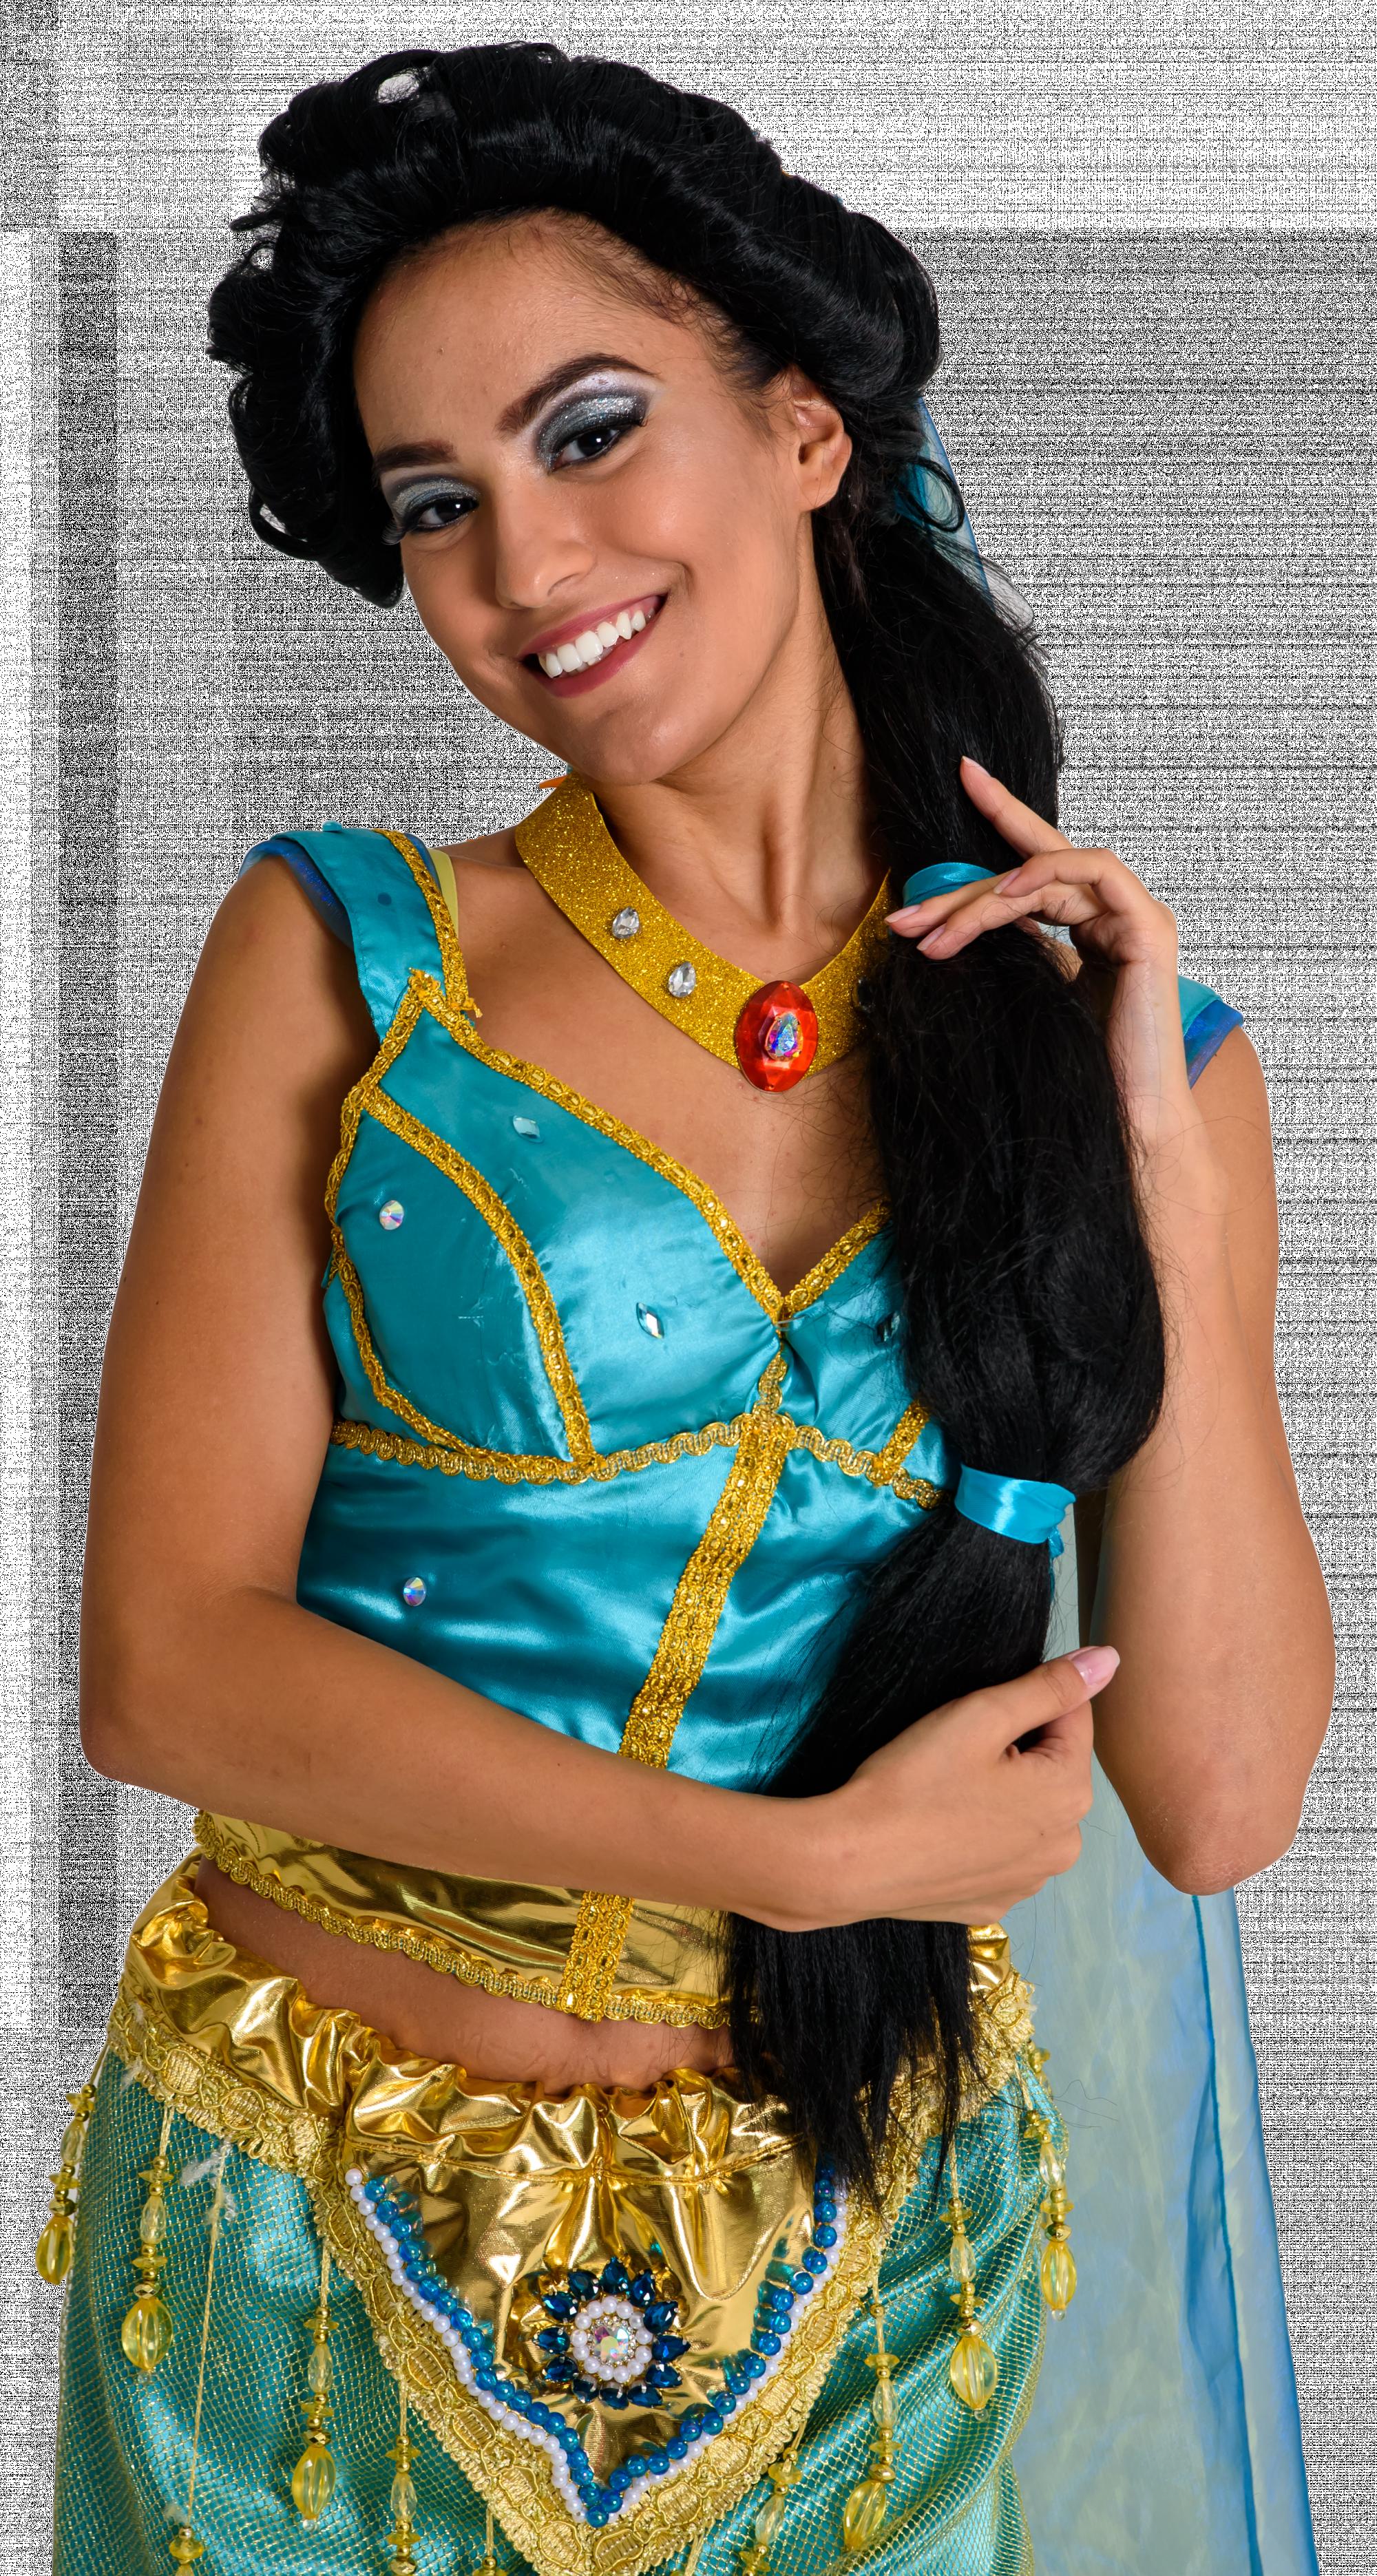 Жасмин и Аладдин   Мастерская Волшебства